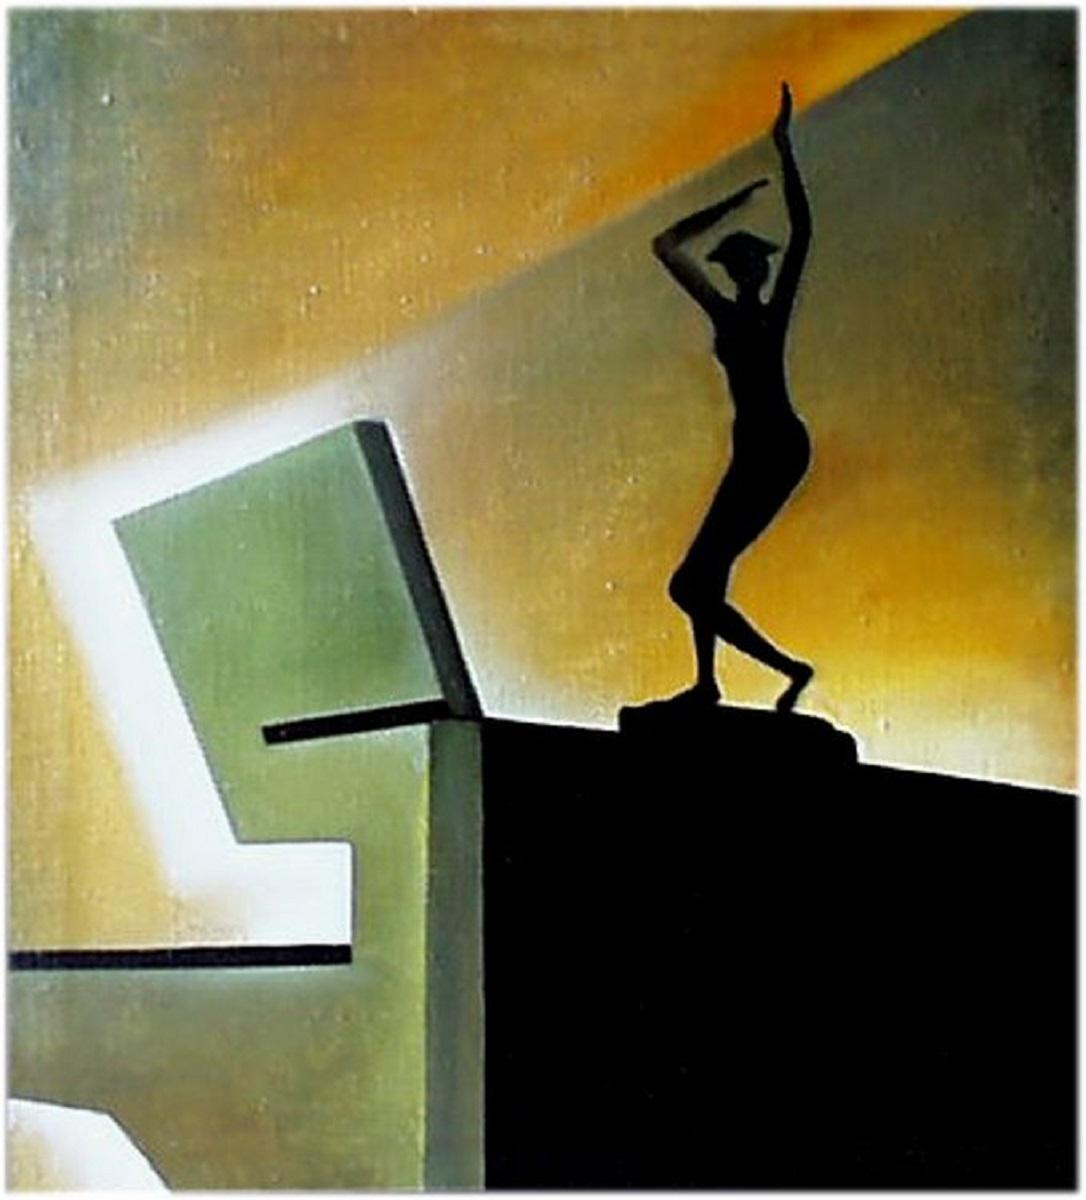 Владимир Васильевич Абаимов. The Statuette in Interior